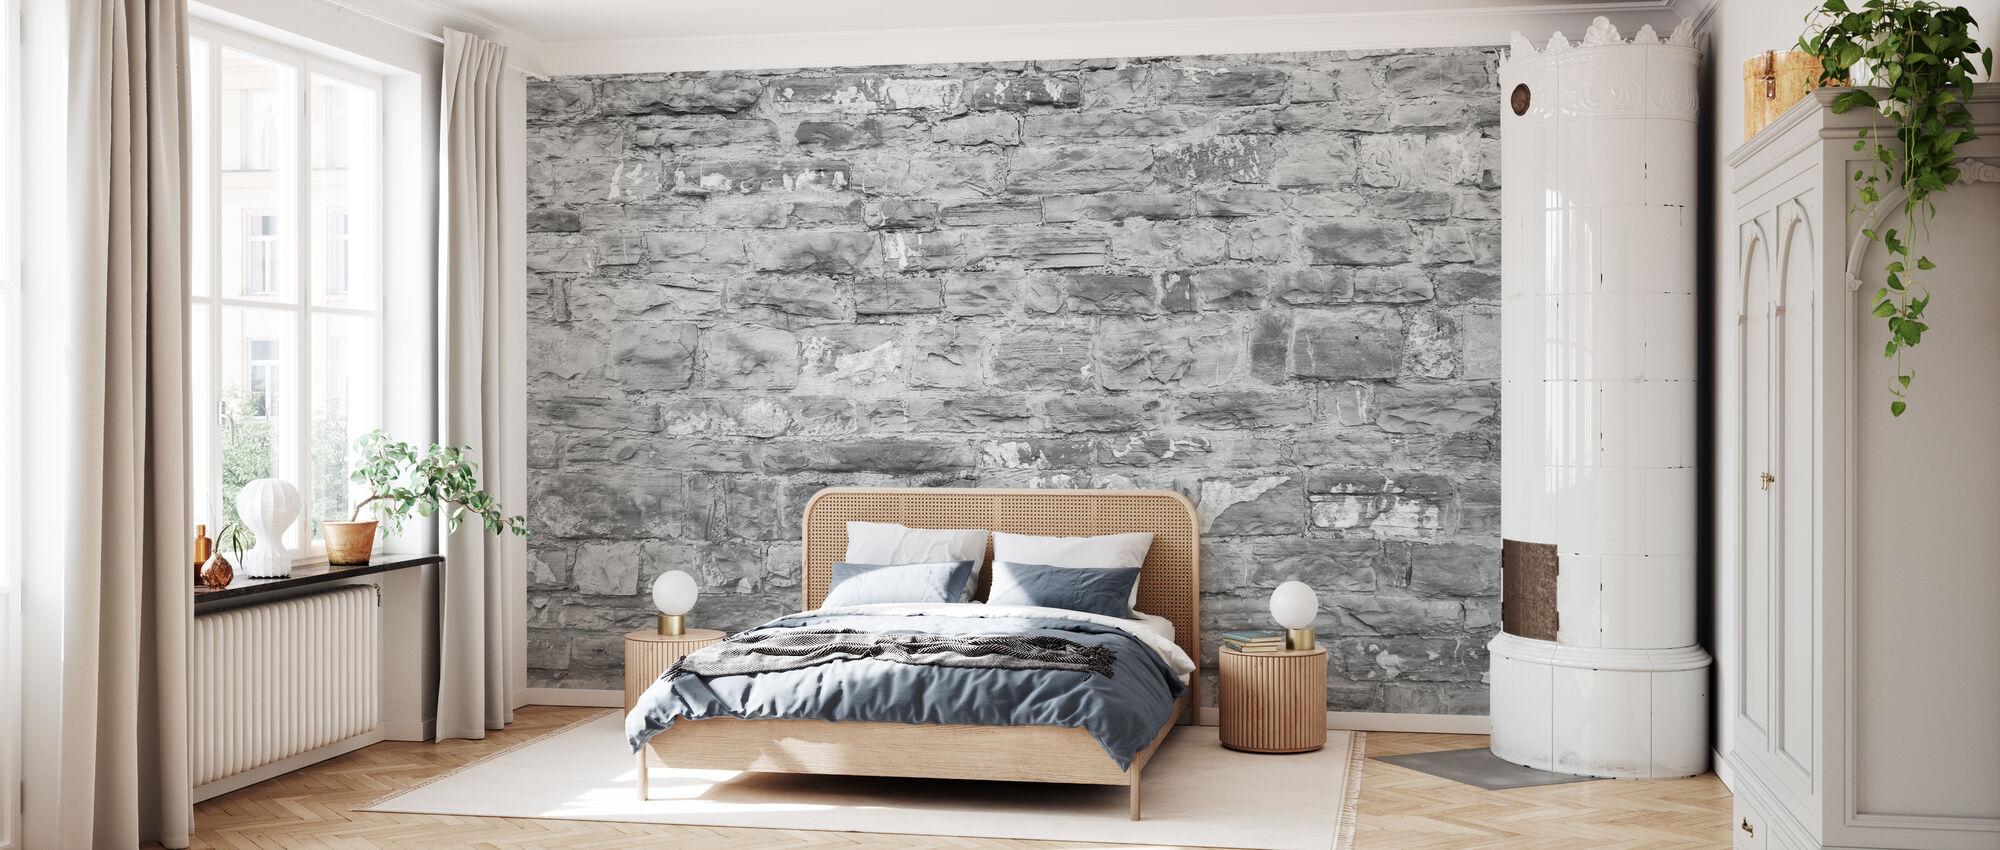 Covered Brick Wall - Wallpaper - Bedroom